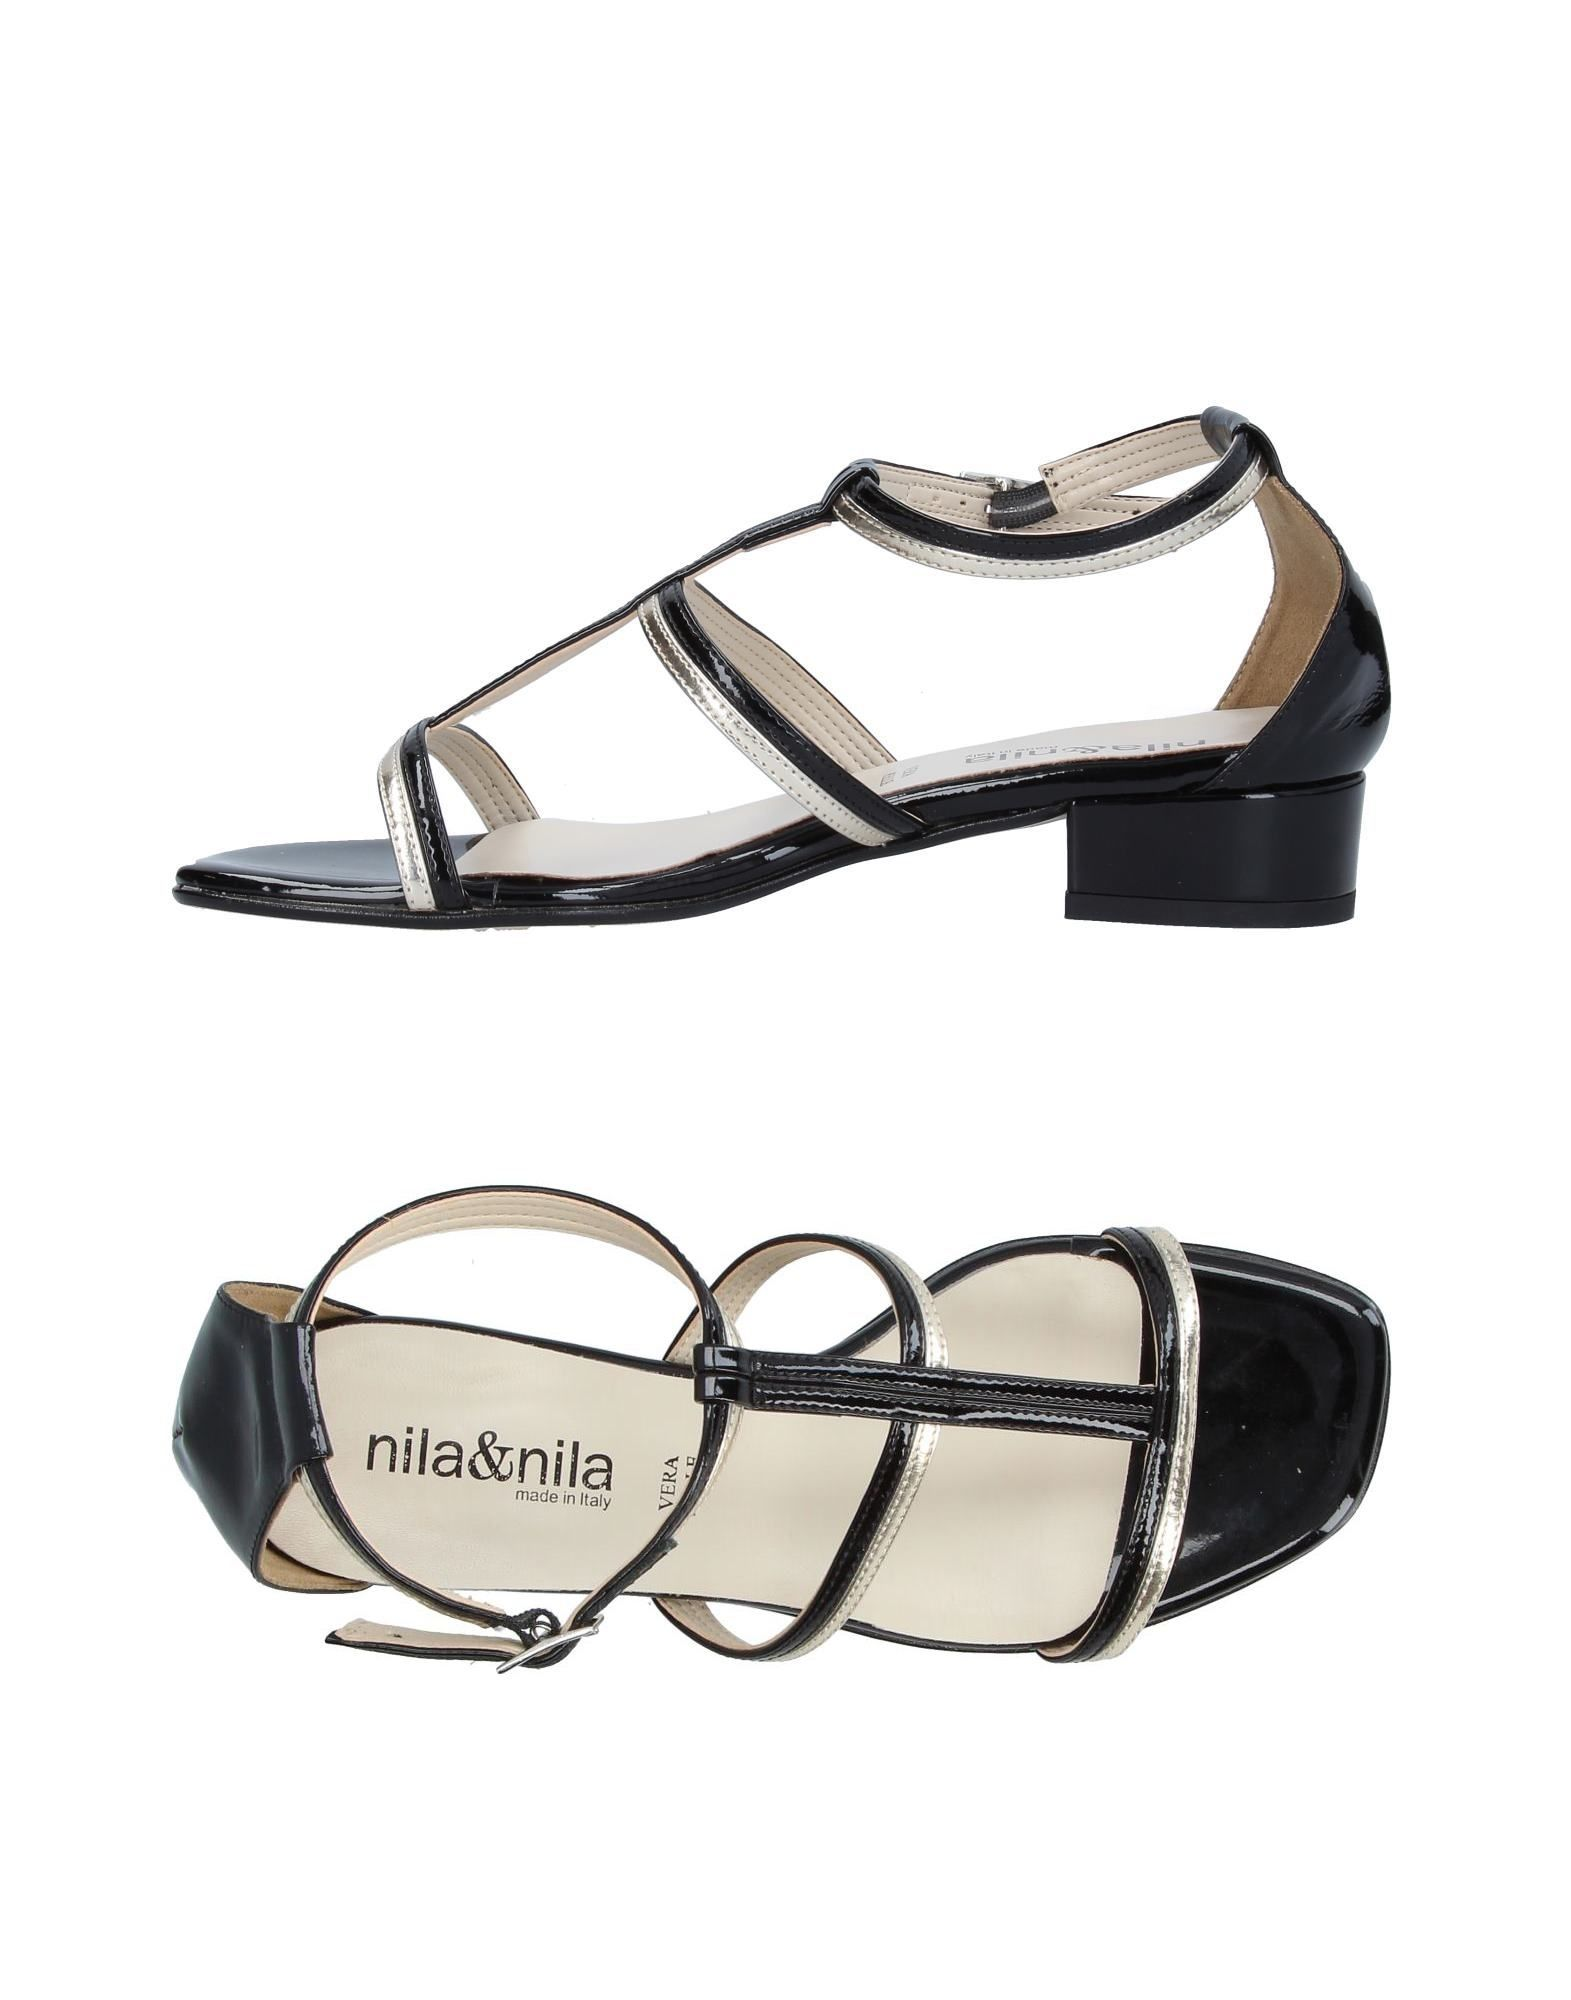 Nila & Nila Sandalen Damen  11348589TD Gute Qualität beliebte Schuhe